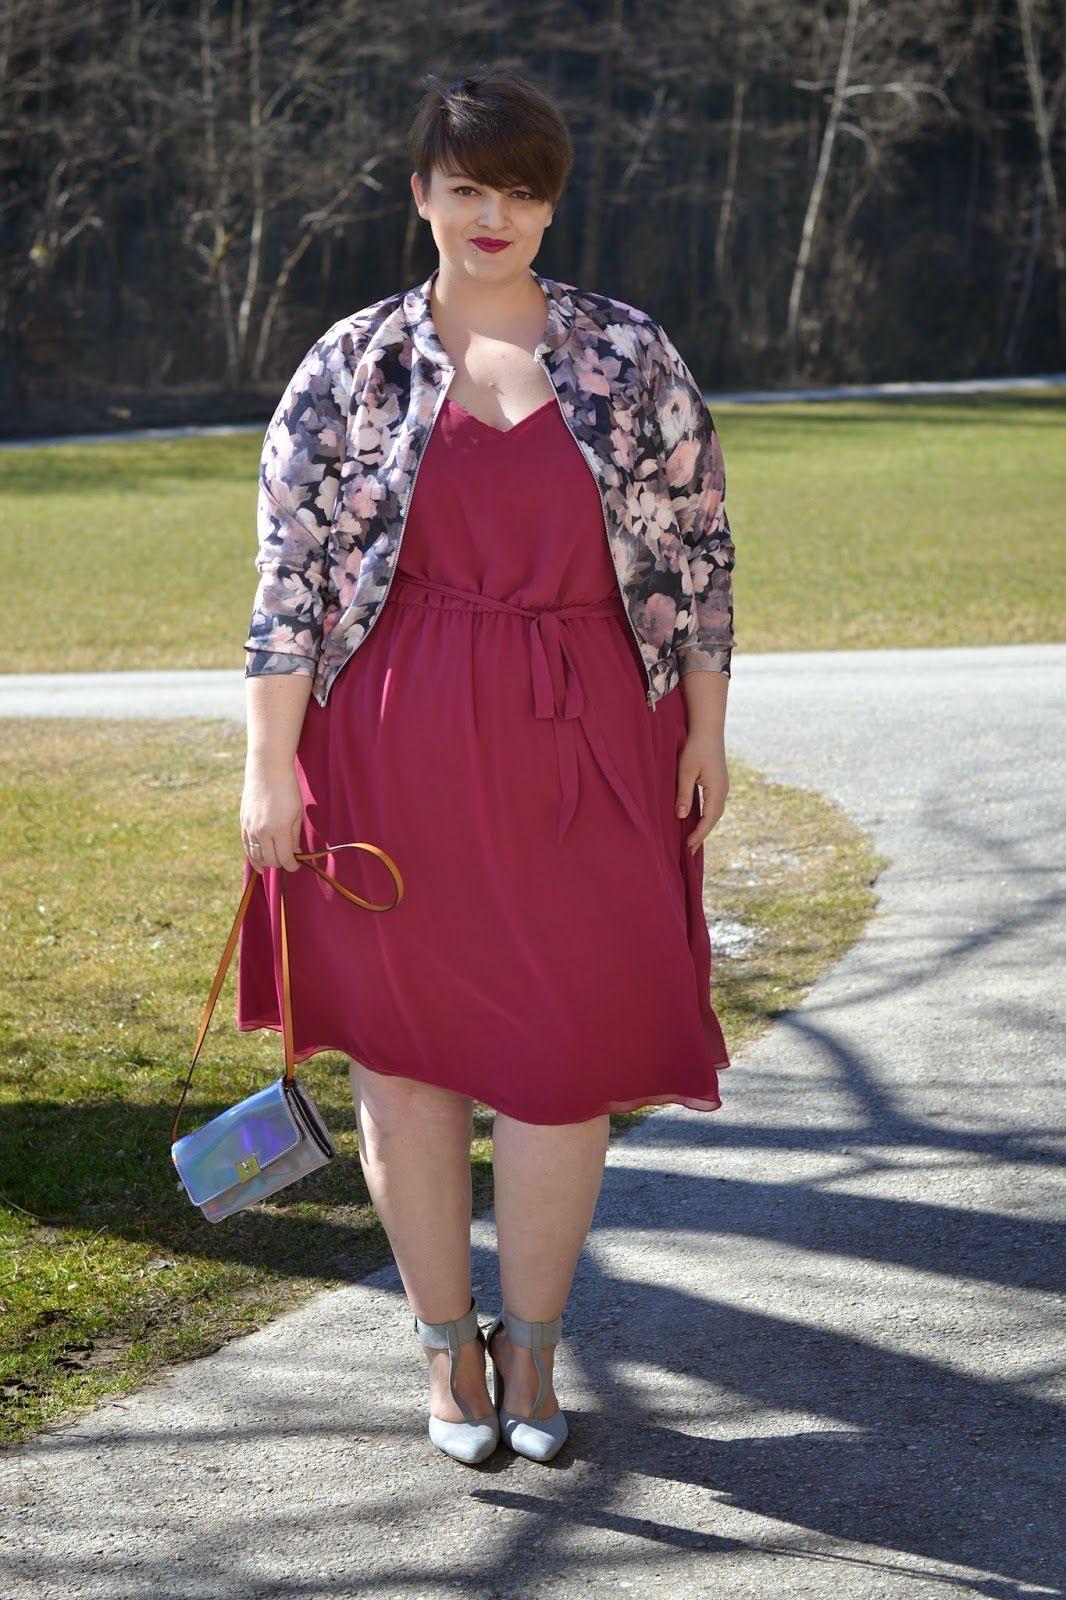 Plus Size Fashion  Curvy Claudia Happy Women'S Day